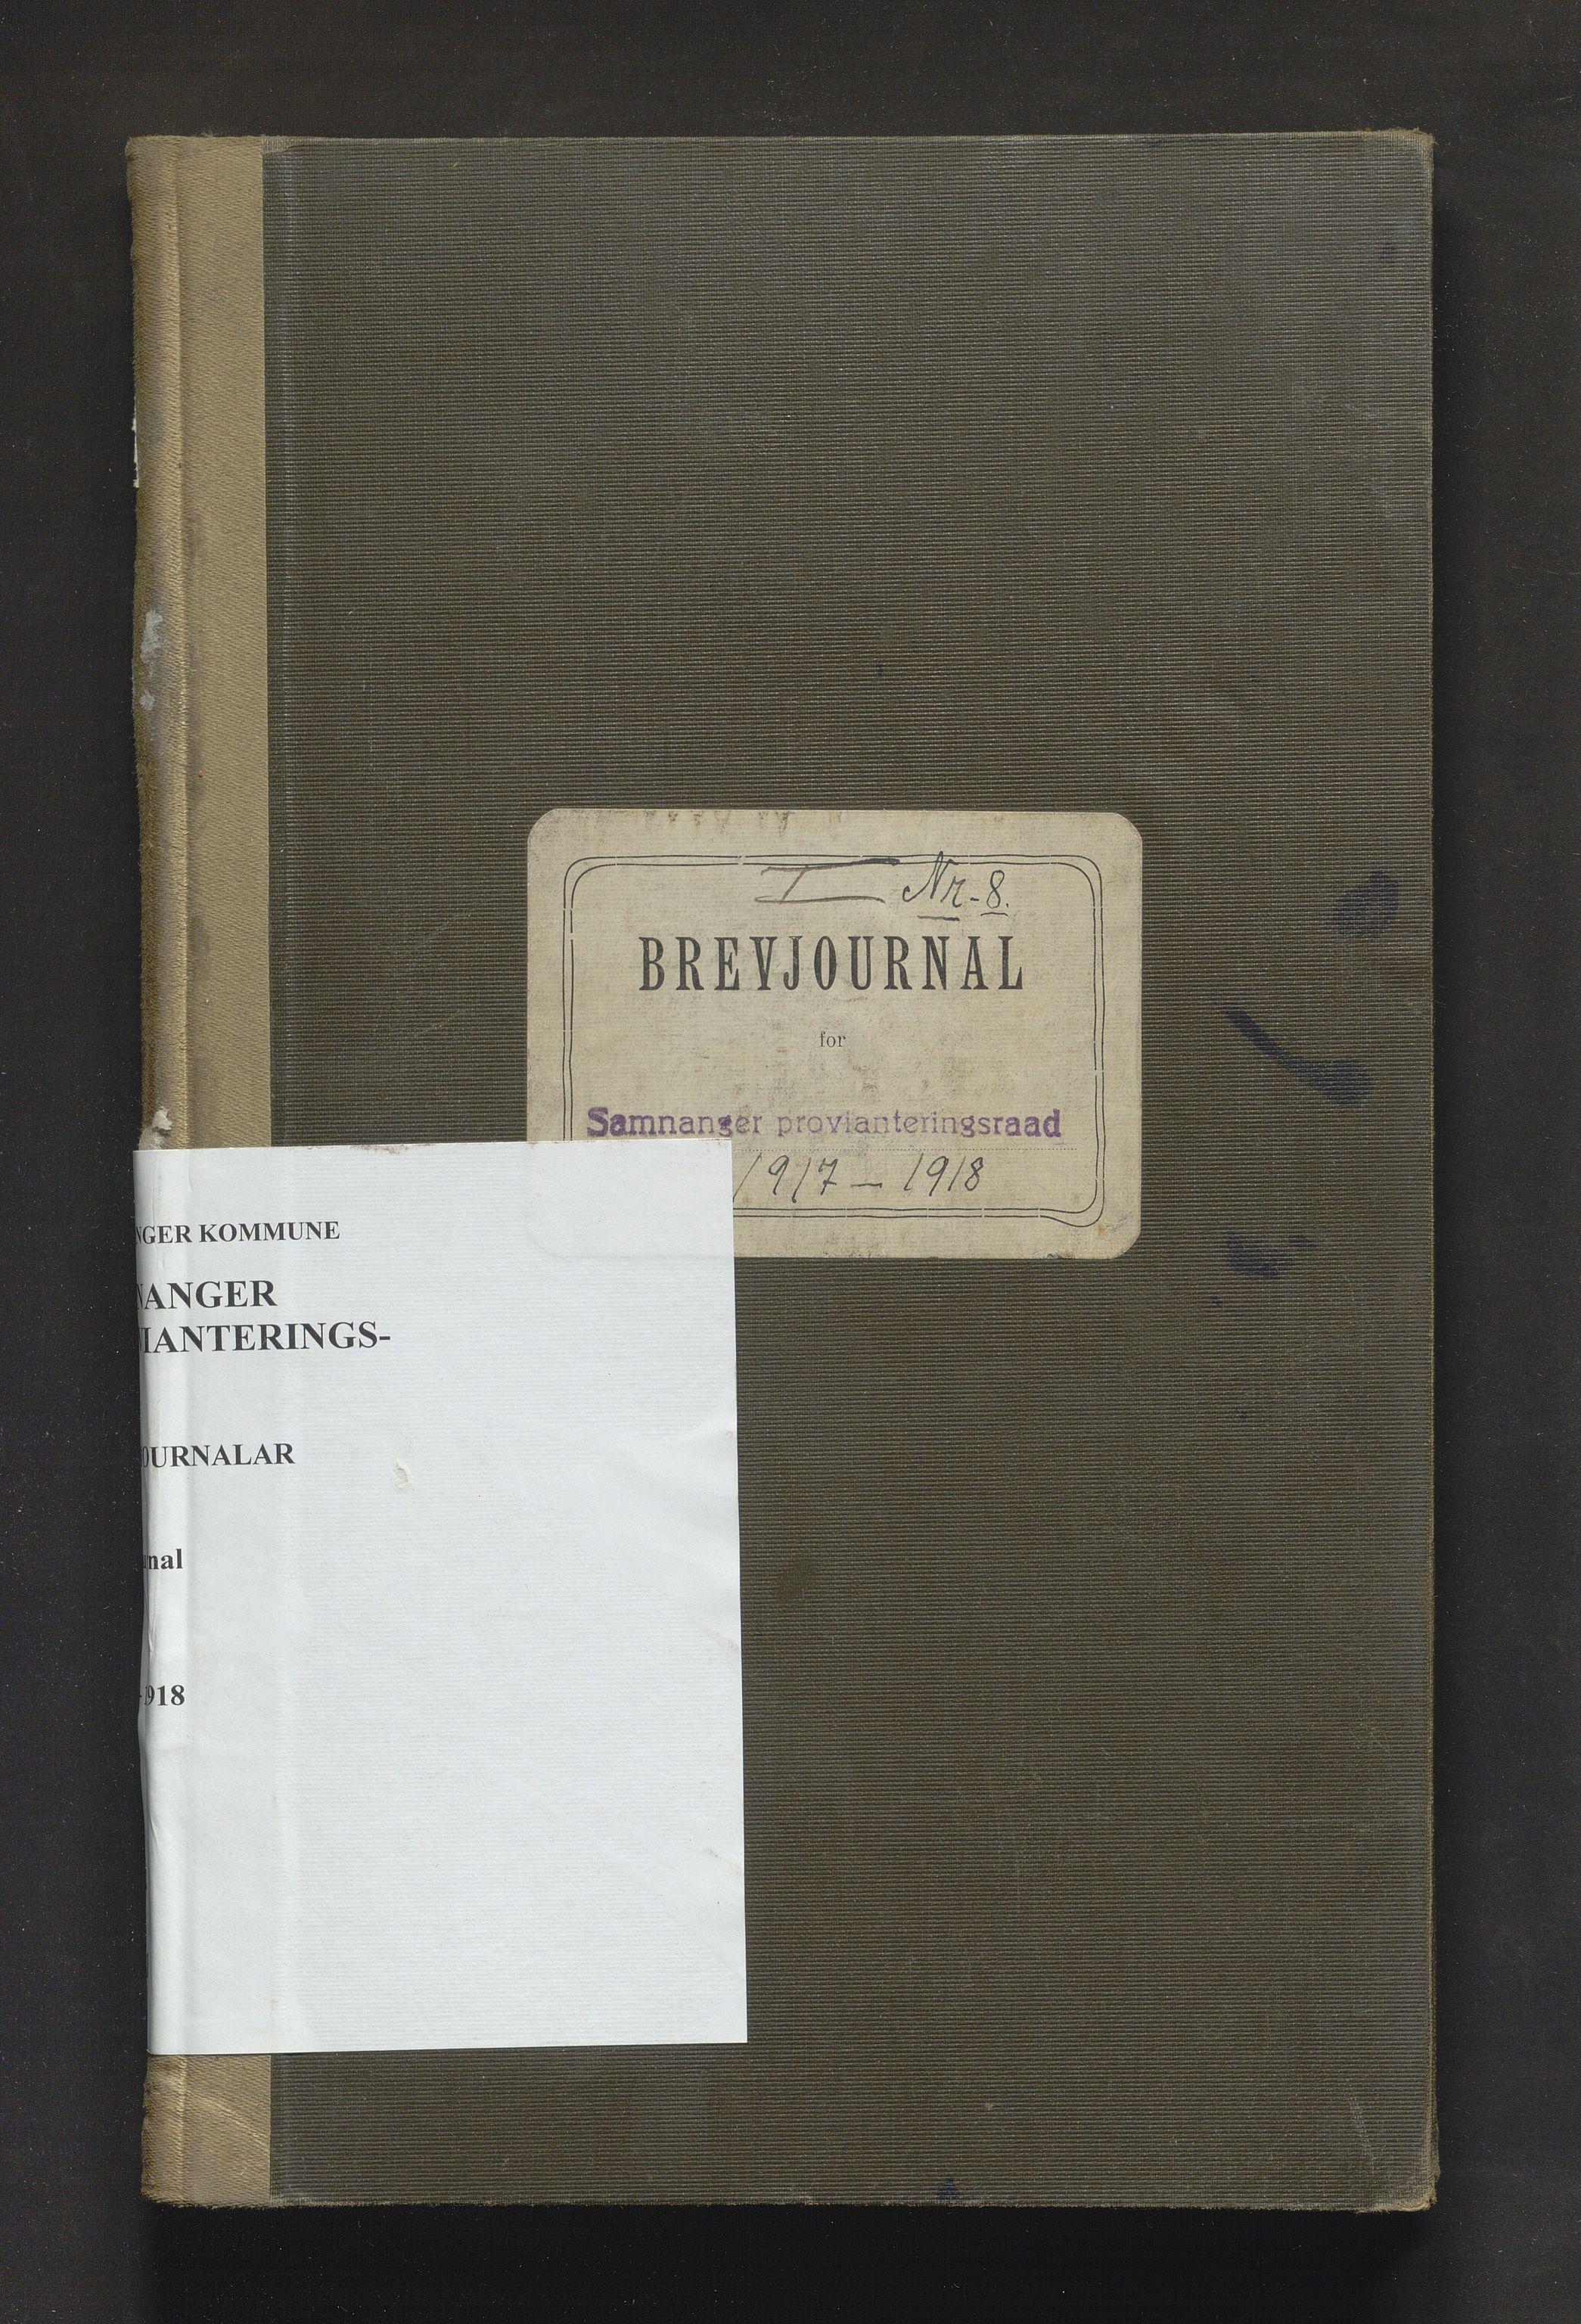 IKAH, Samnanger kommune. Provianteringsrådet, C/Ca/L0001: Postjournal for Samnanger provianteringsråd, 1917-1918